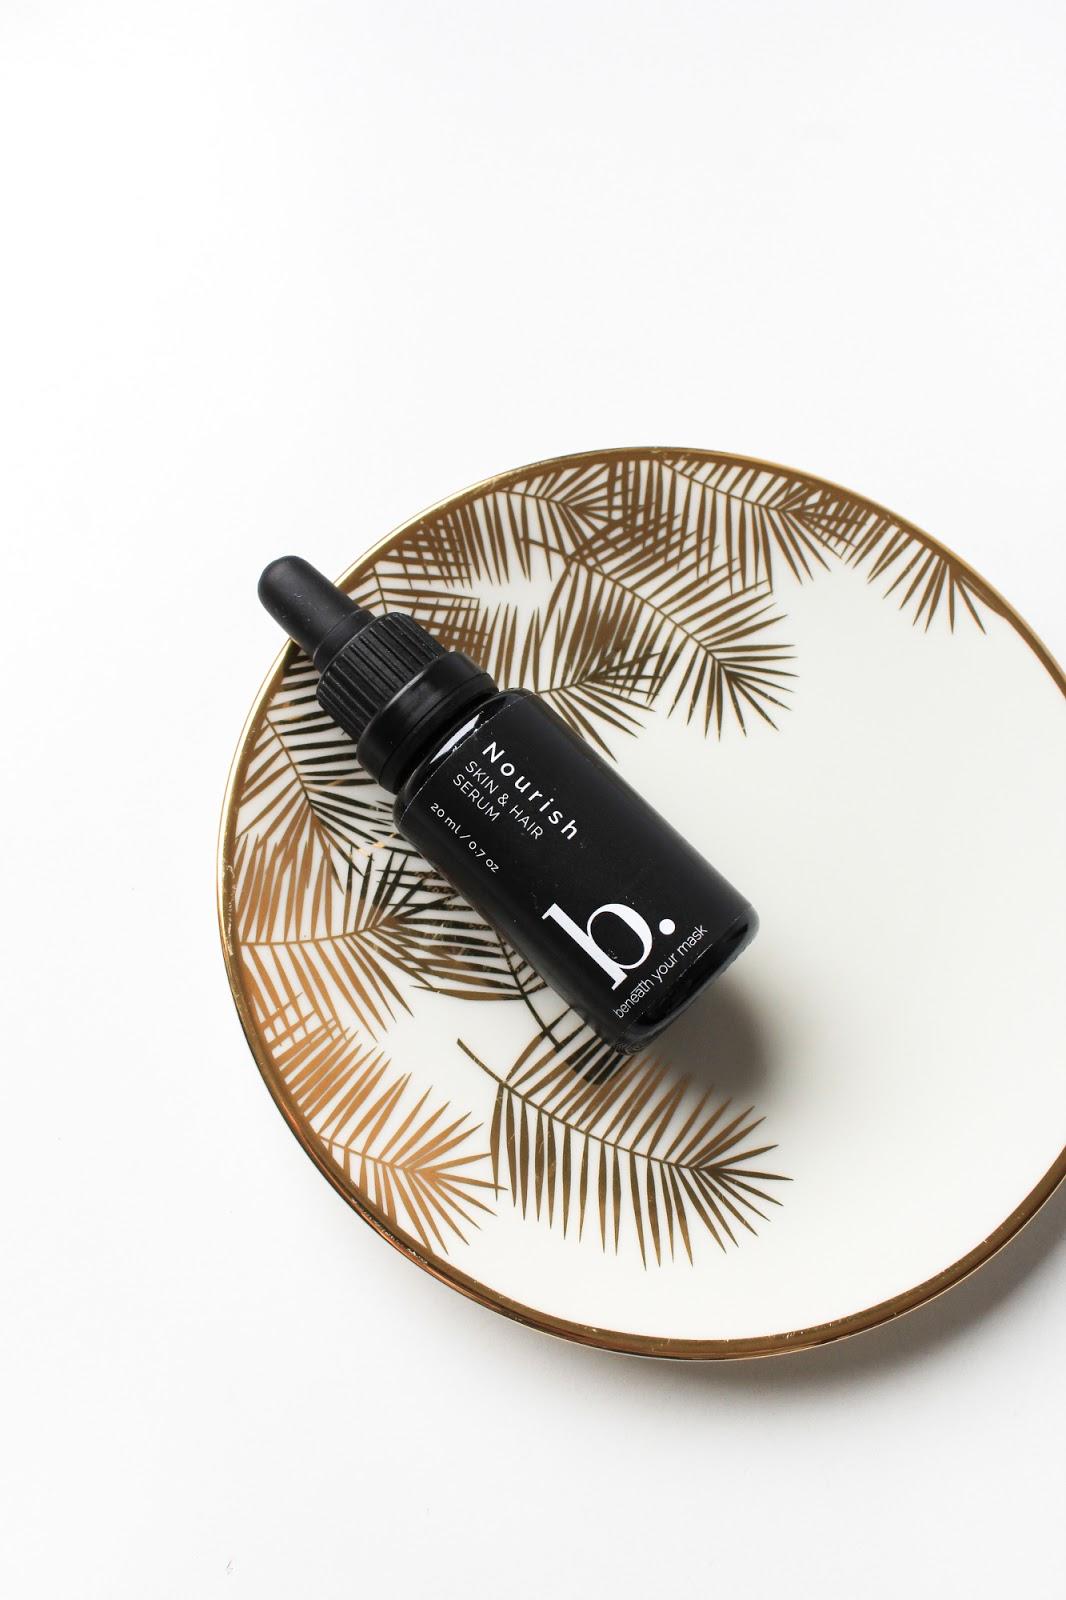 March Clean Beauty Box Indulge Beneath Your Mask Nourish Skin + Hair Serum